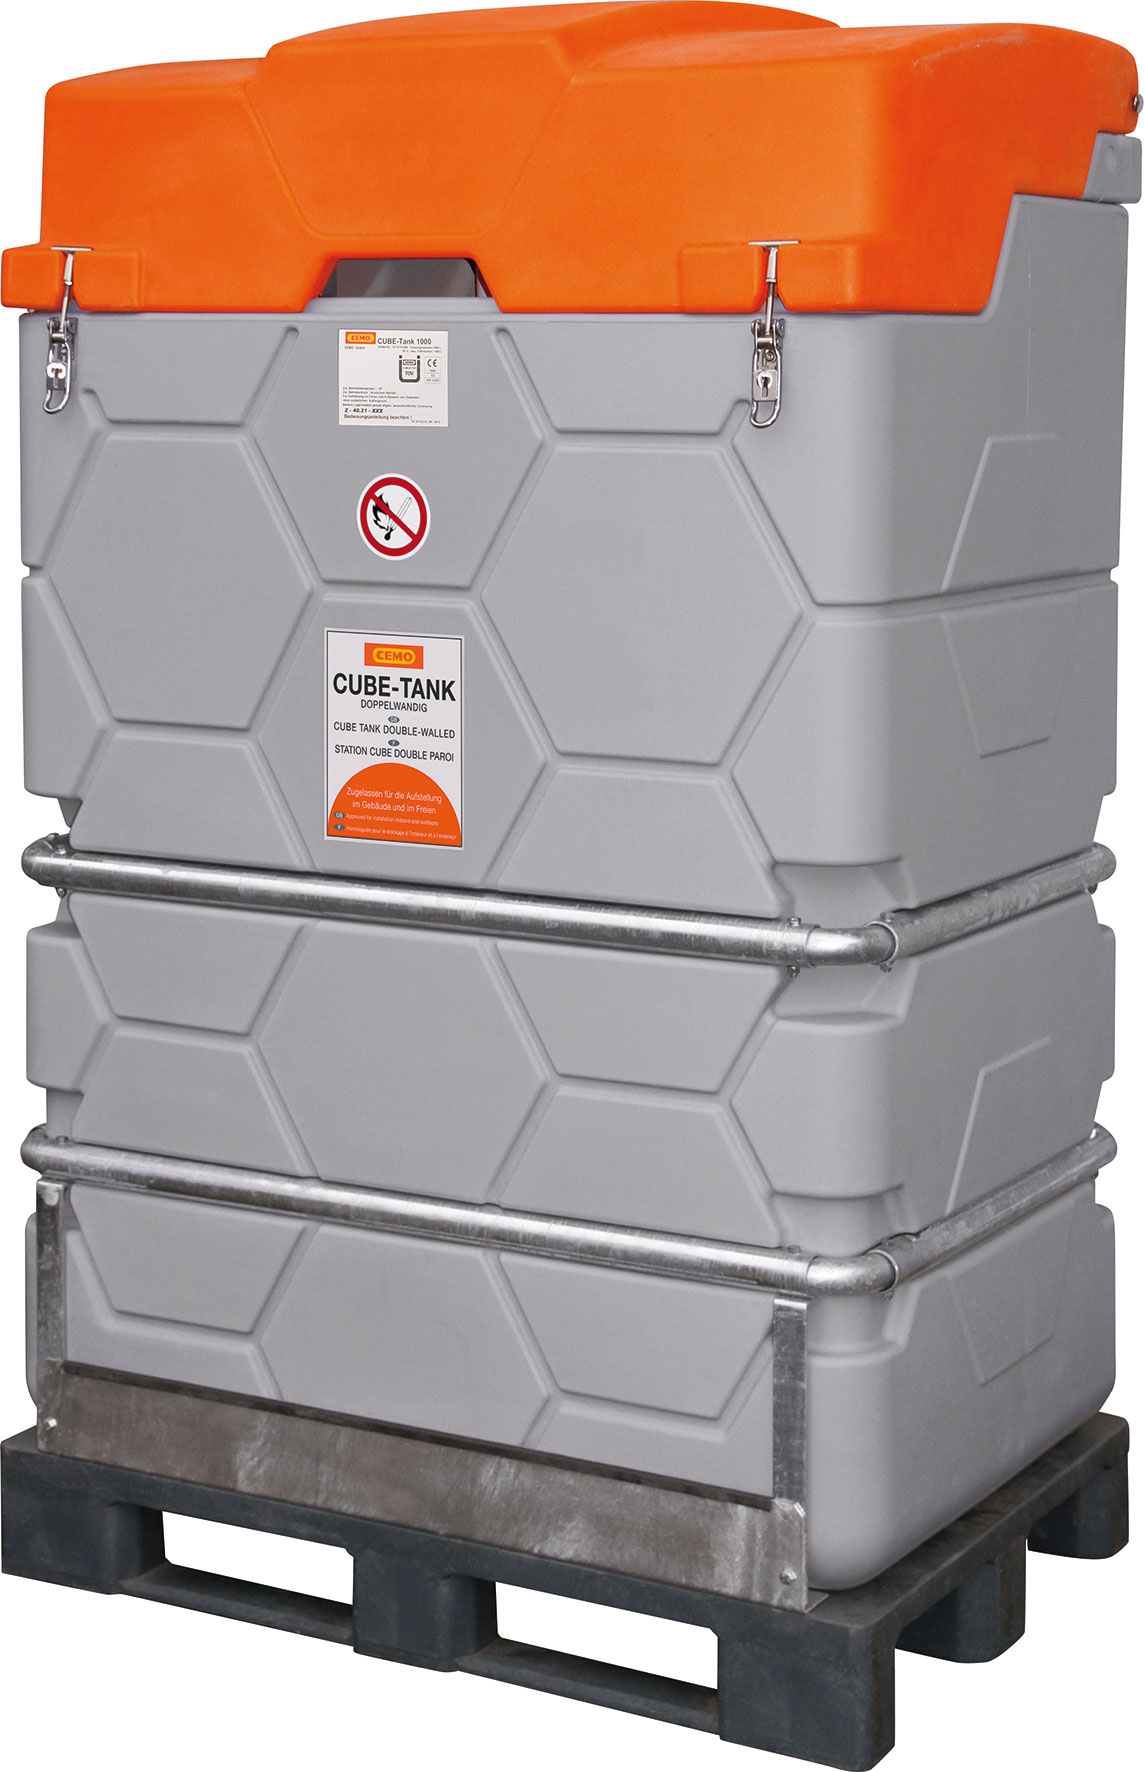 cube heiz ltank mobil inhalt 1000 l abma e lxbxh 120x80x195 cm wocken industriepartner. Black Bedroom Furniture Sets. Home Design Ideas